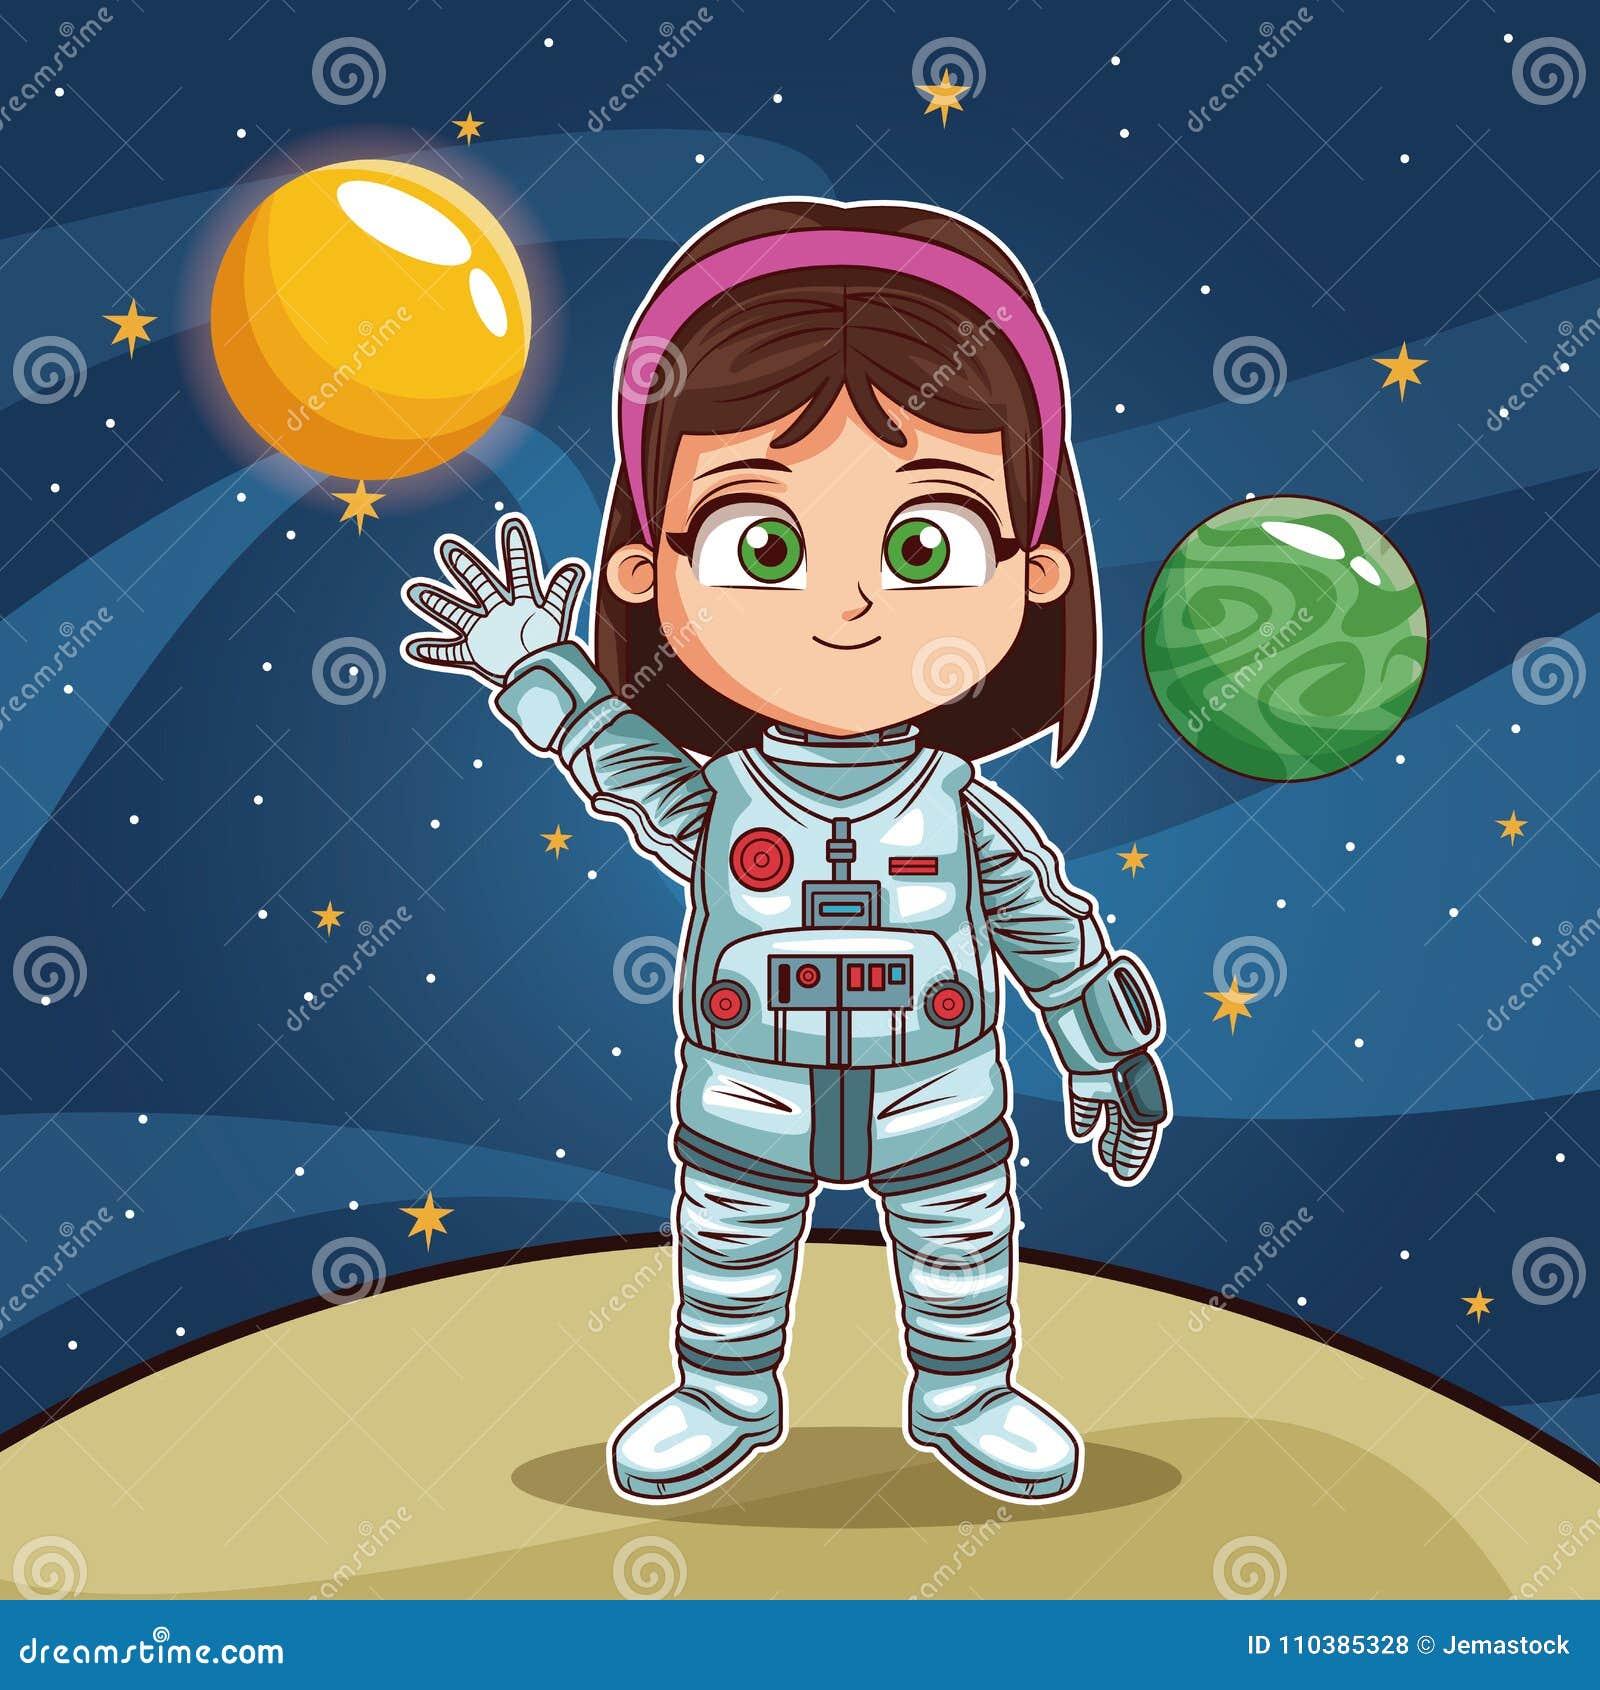 Girl Astronaut On Planet Cartoon Stock Vector Illustration Of